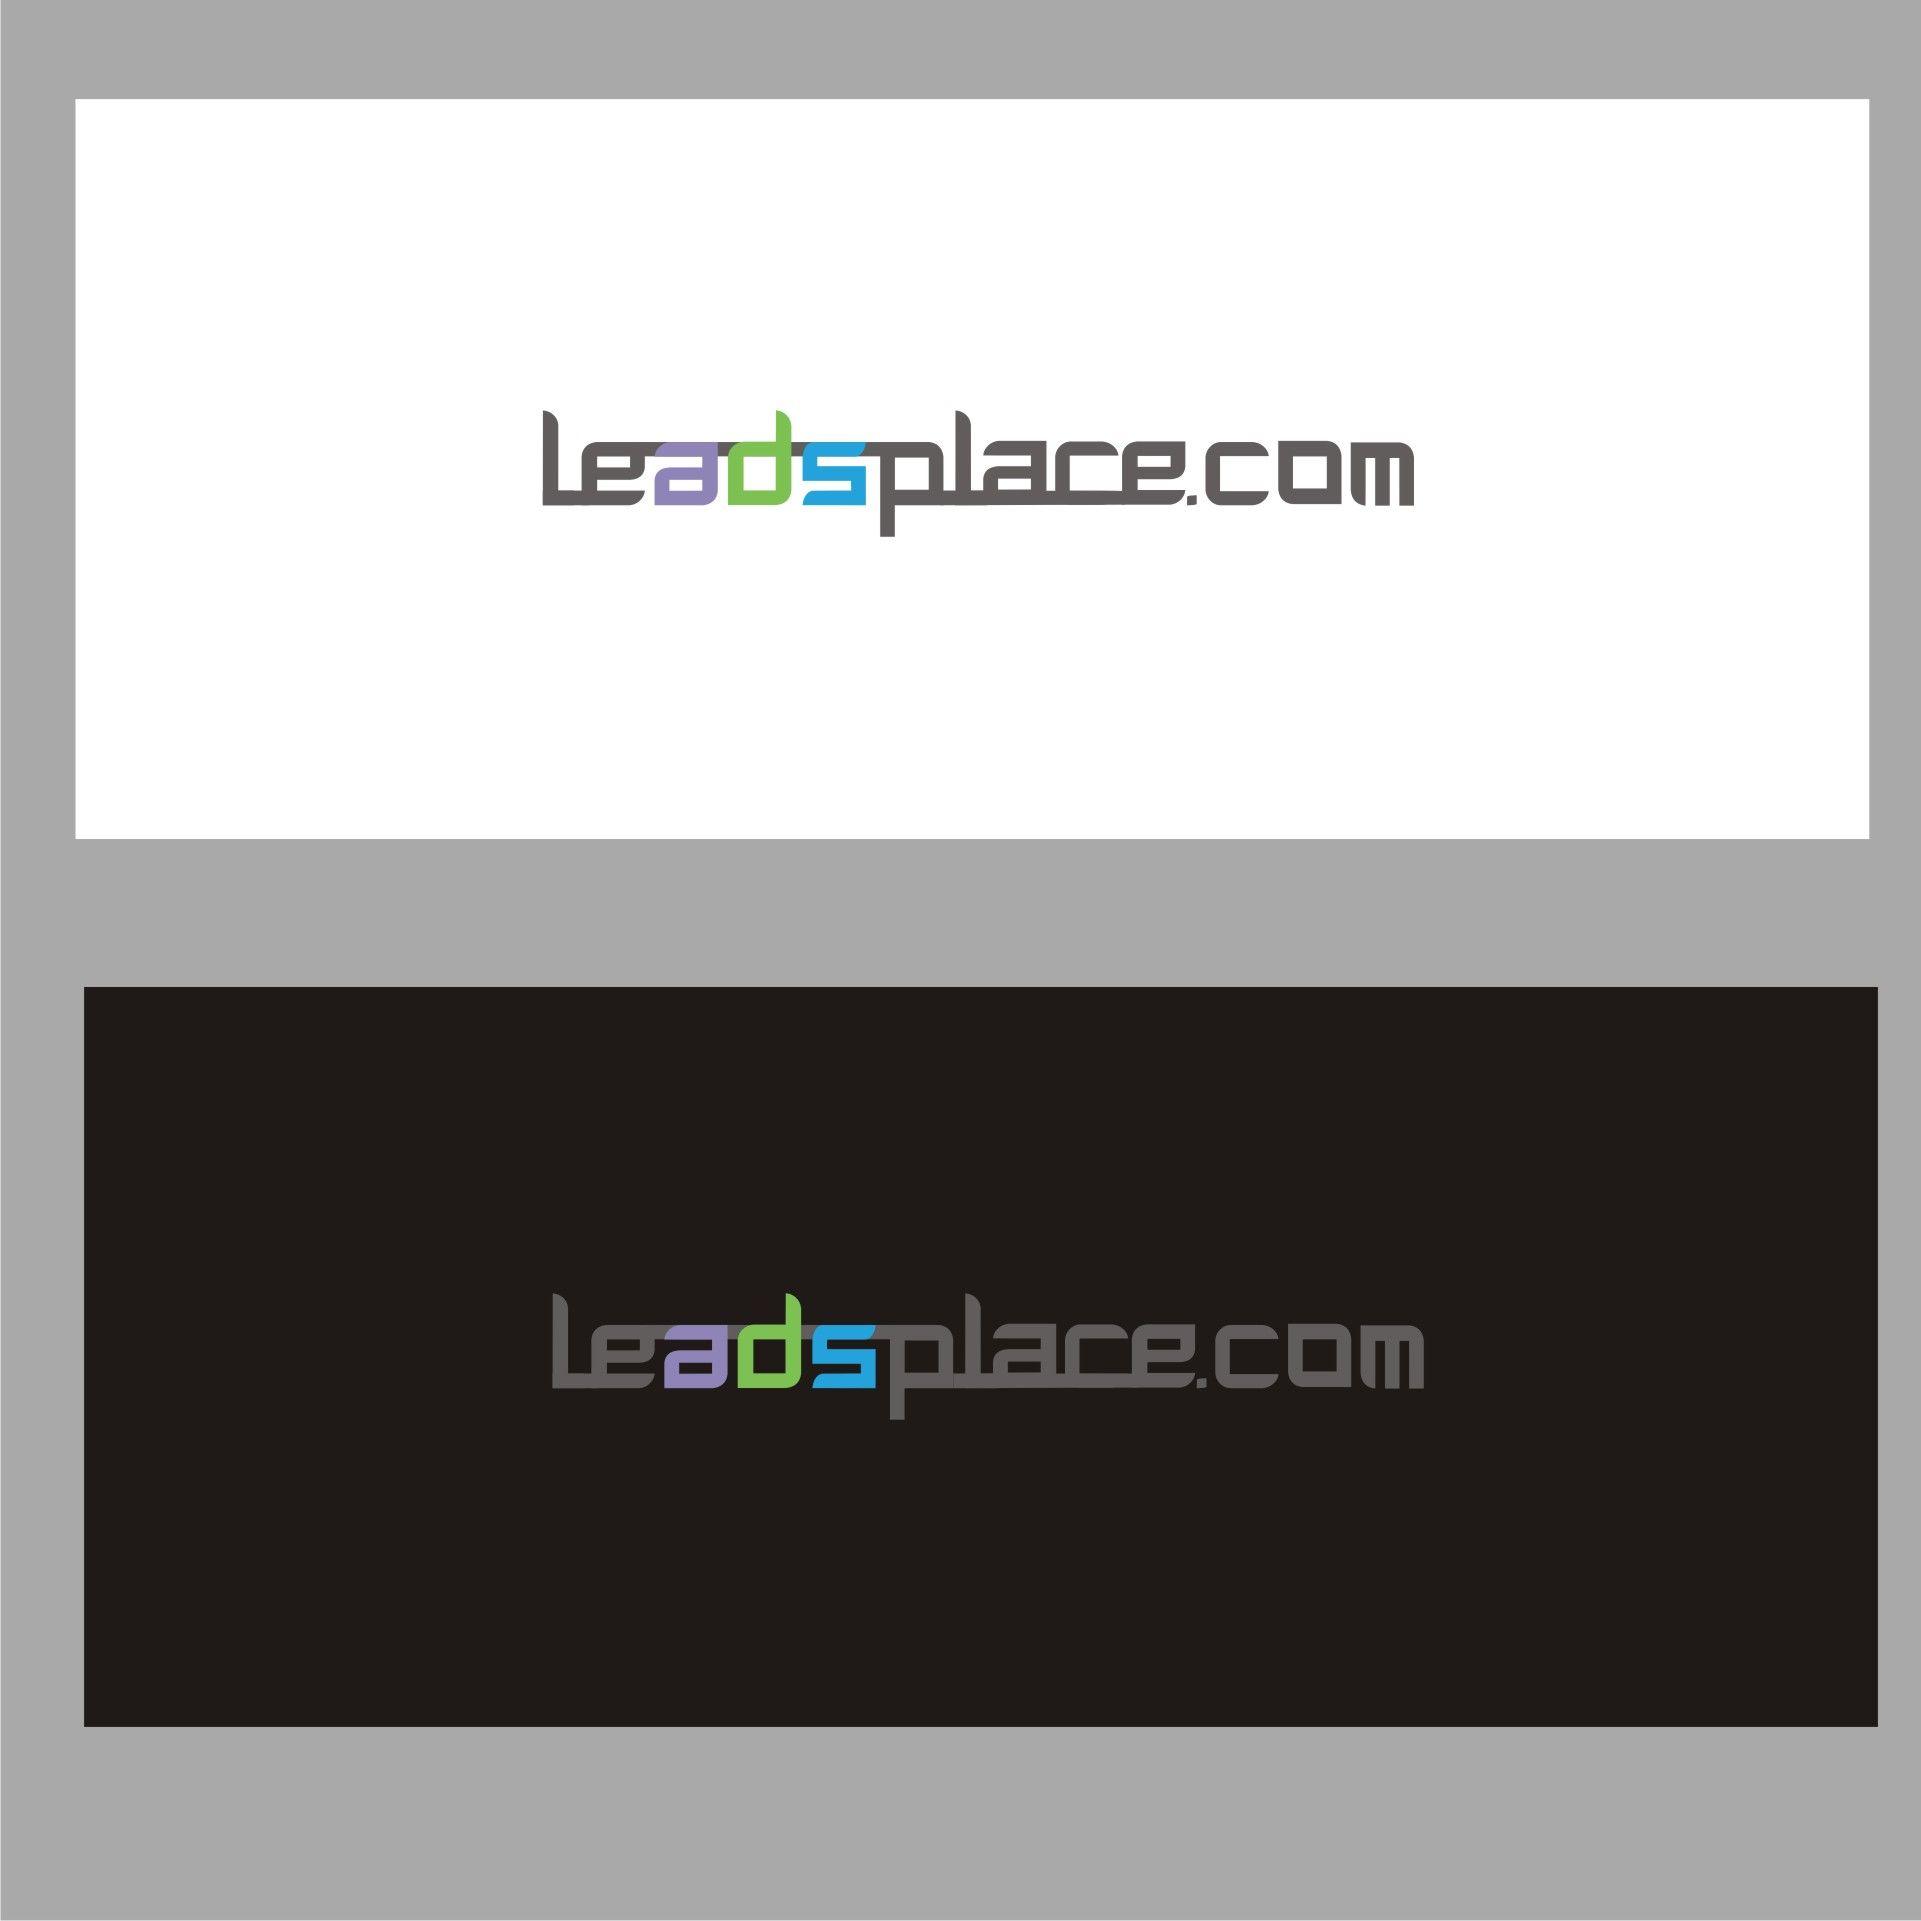 leadsplace.com - логотип - дизайнер dbyjuhfl